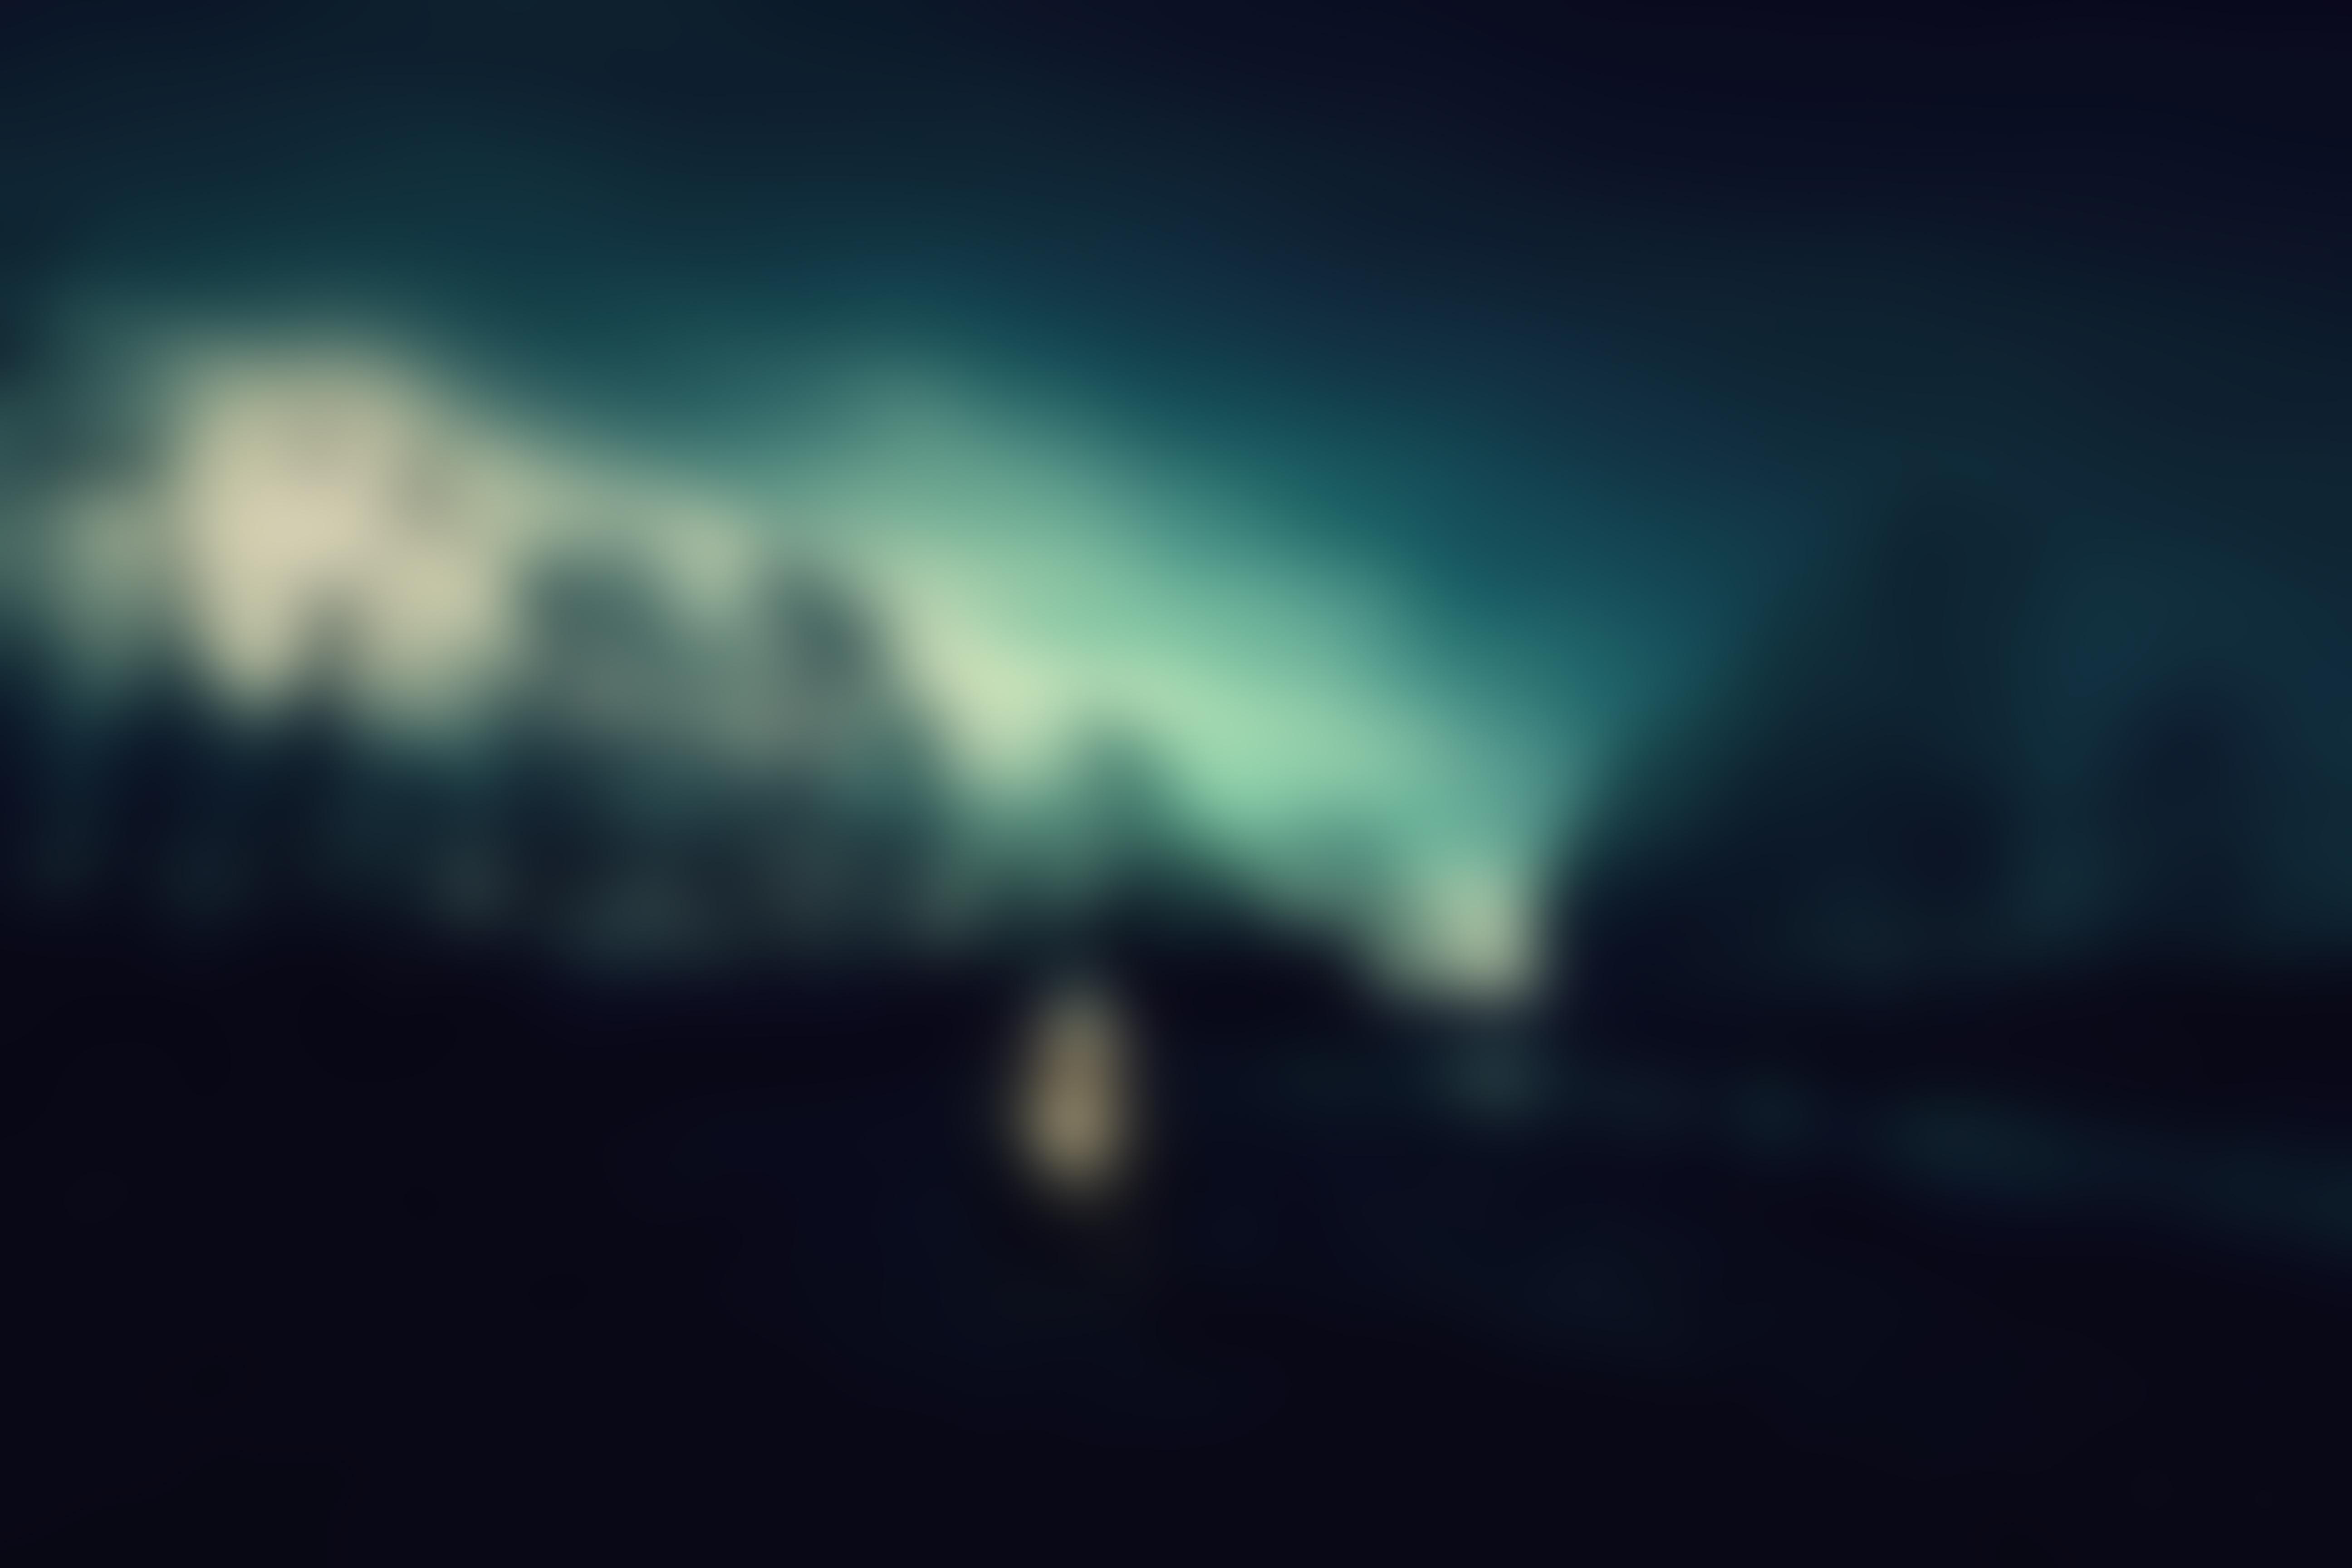 Night Dark Blur Image